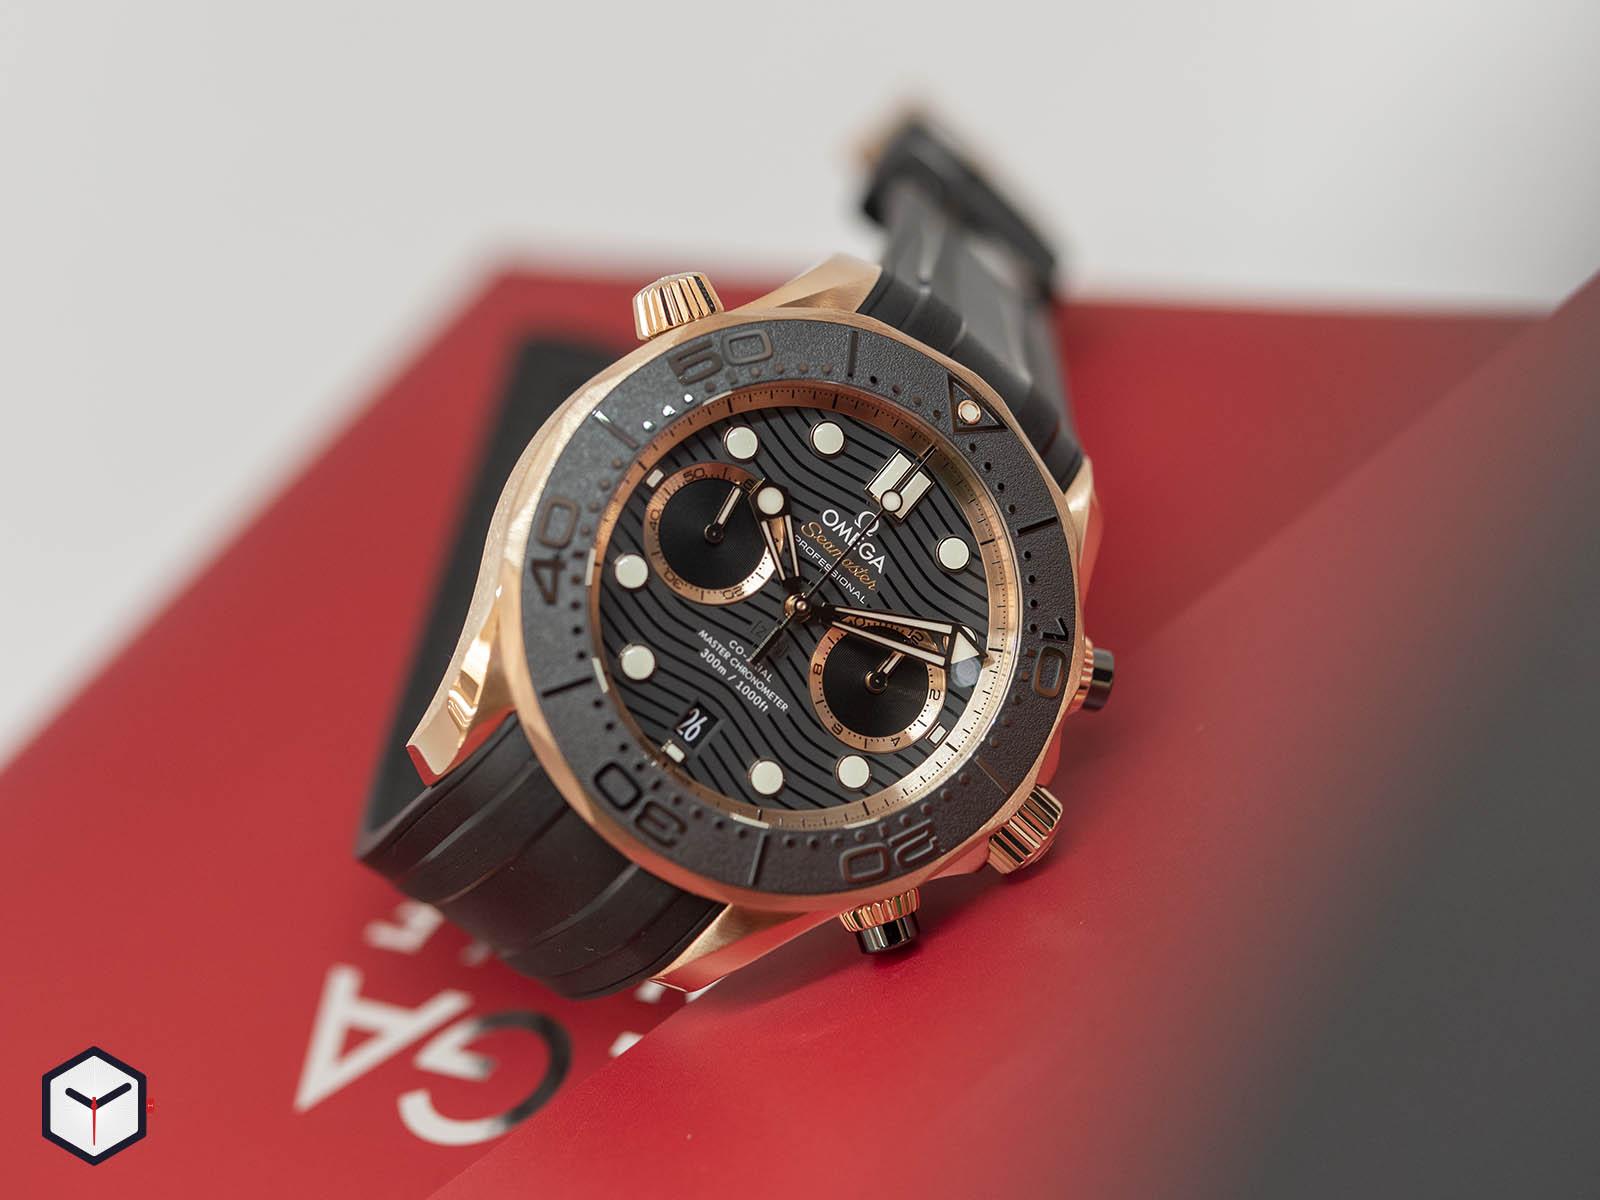 210-62-44-51-01-001-omega-seamaster-diver-300m-co-axial-master-chronometer-chronograph-2.jpg